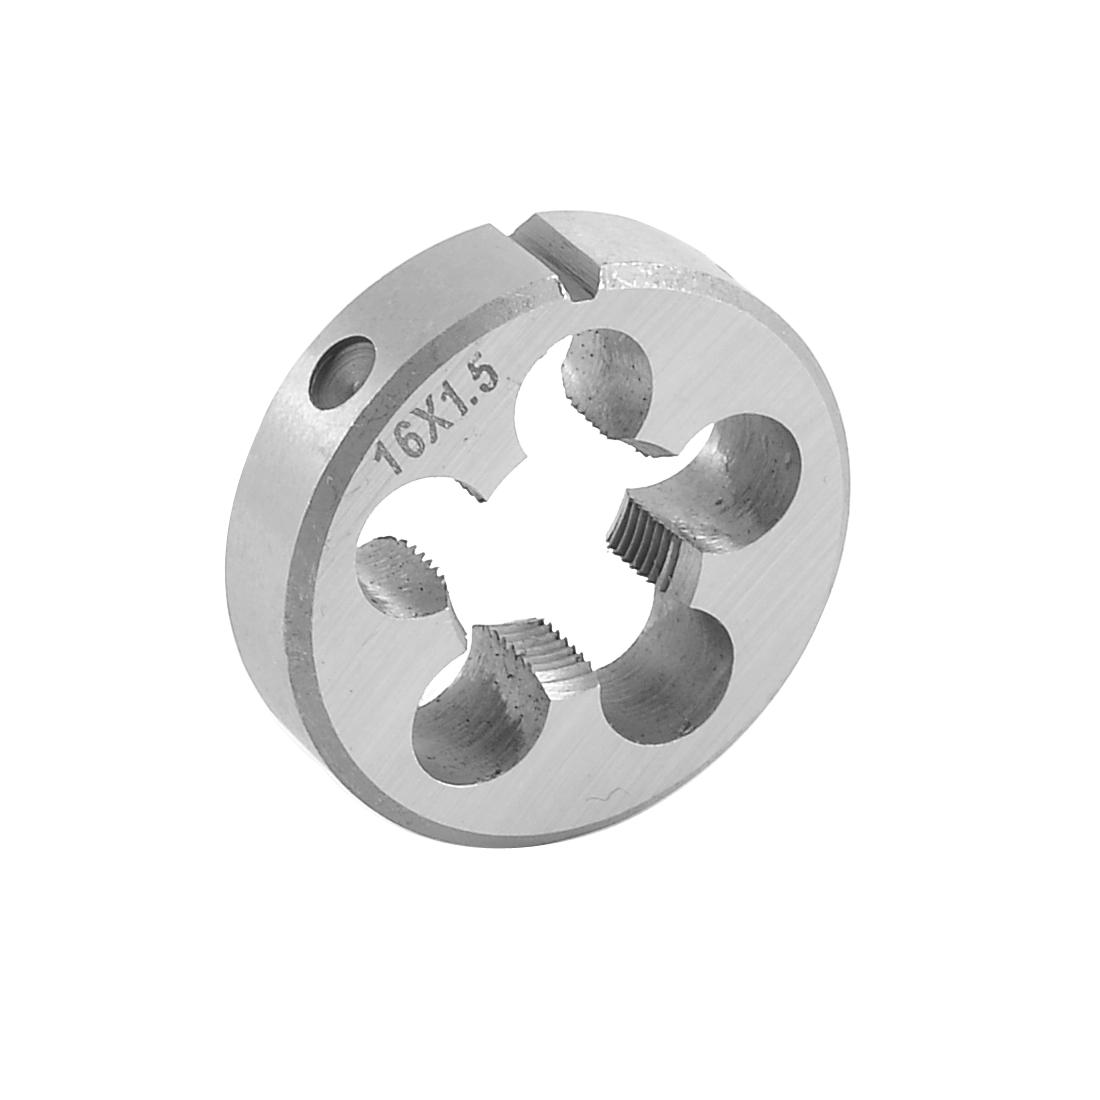 Steel 14mm Thickness Metric M16 x 1.5mm Screw Thread Round Die Tool